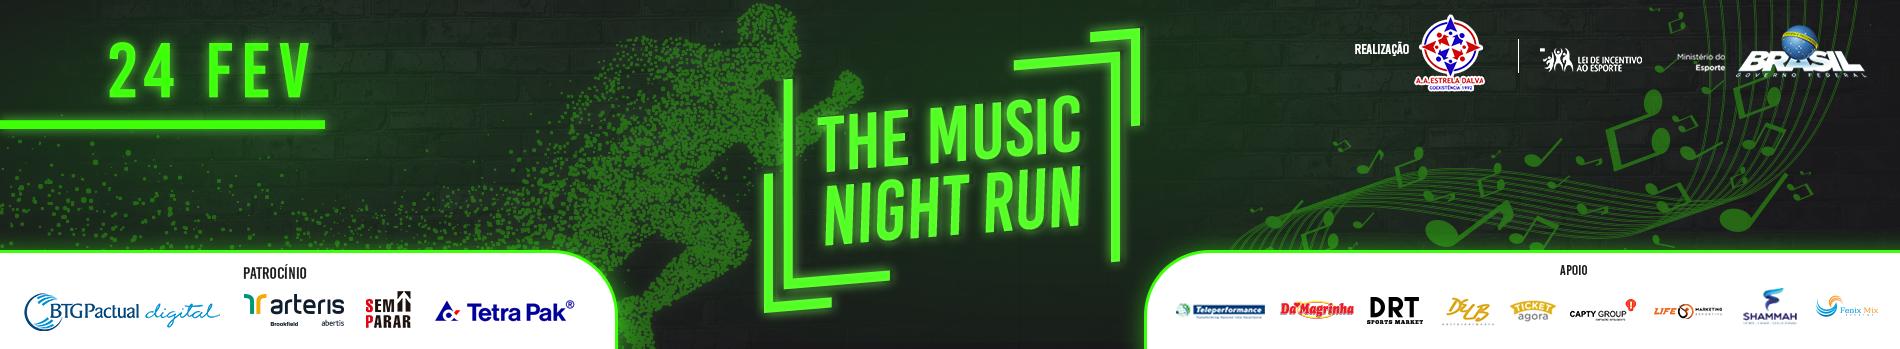 THE MUSIC NIGHT RUN - Imagem de topo